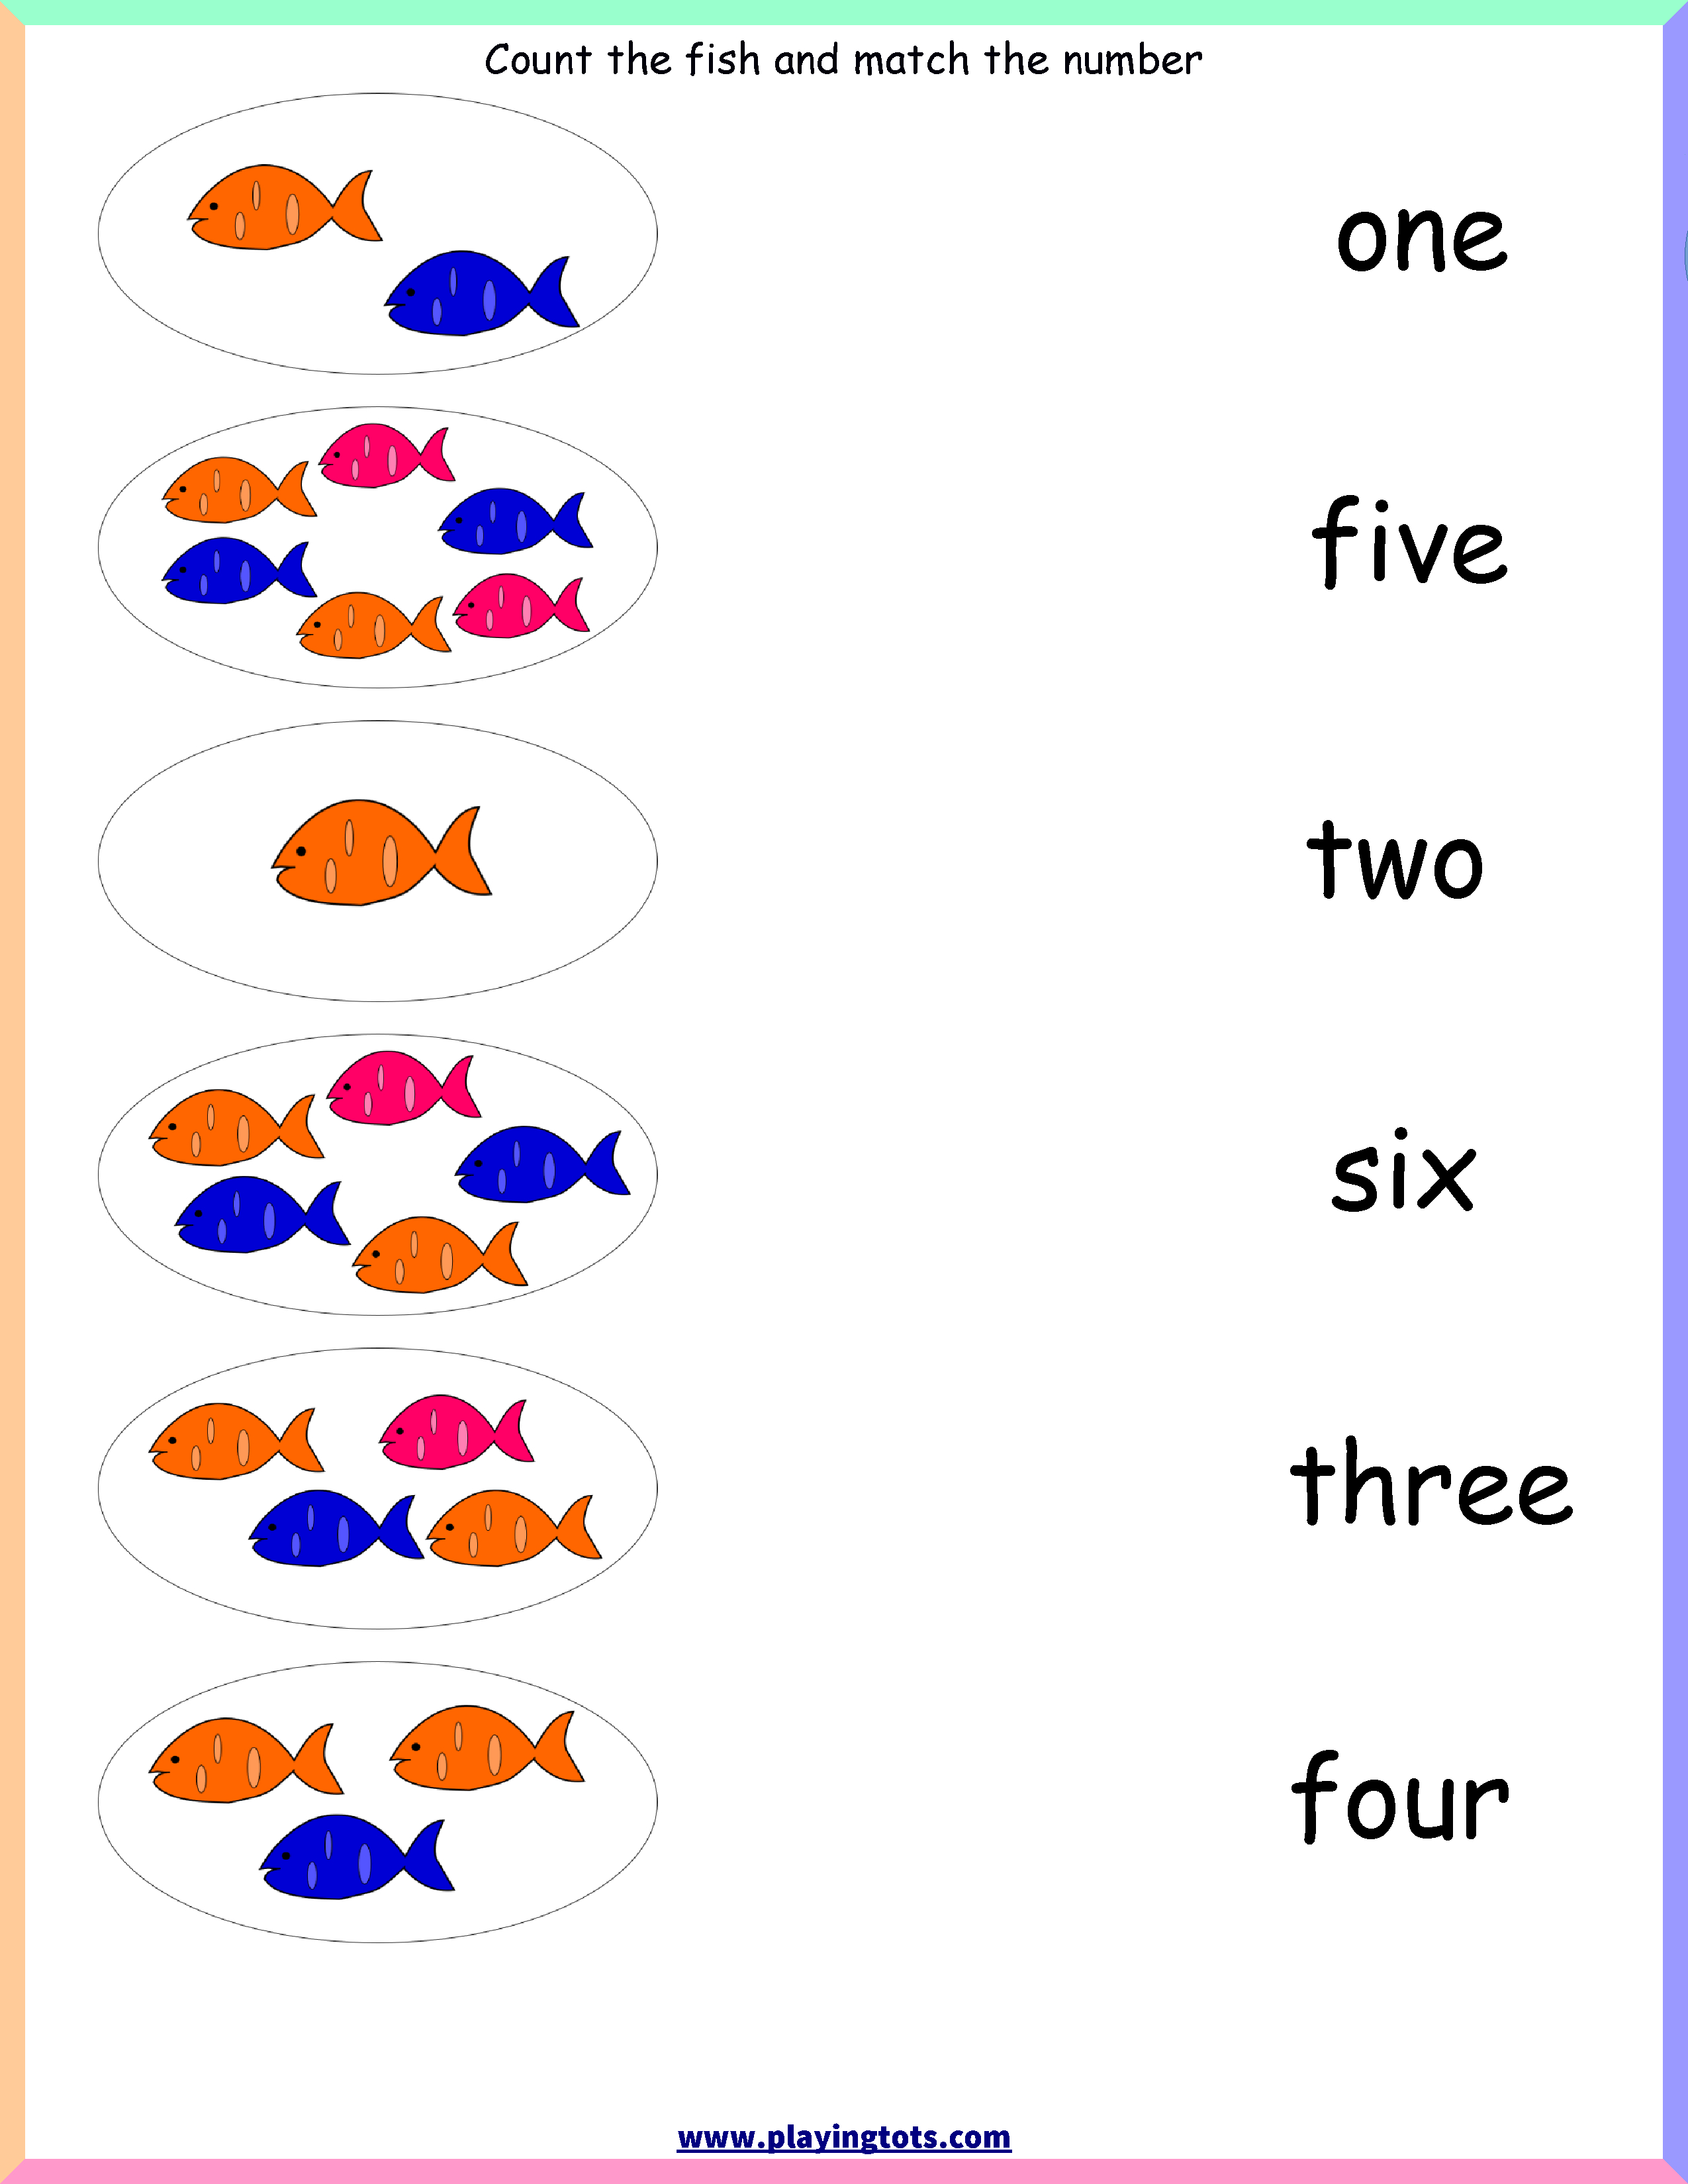 Worksheet,free,printable,count,activity,match,fish,numbers,words - Free Printable File Folders For Preschoolers